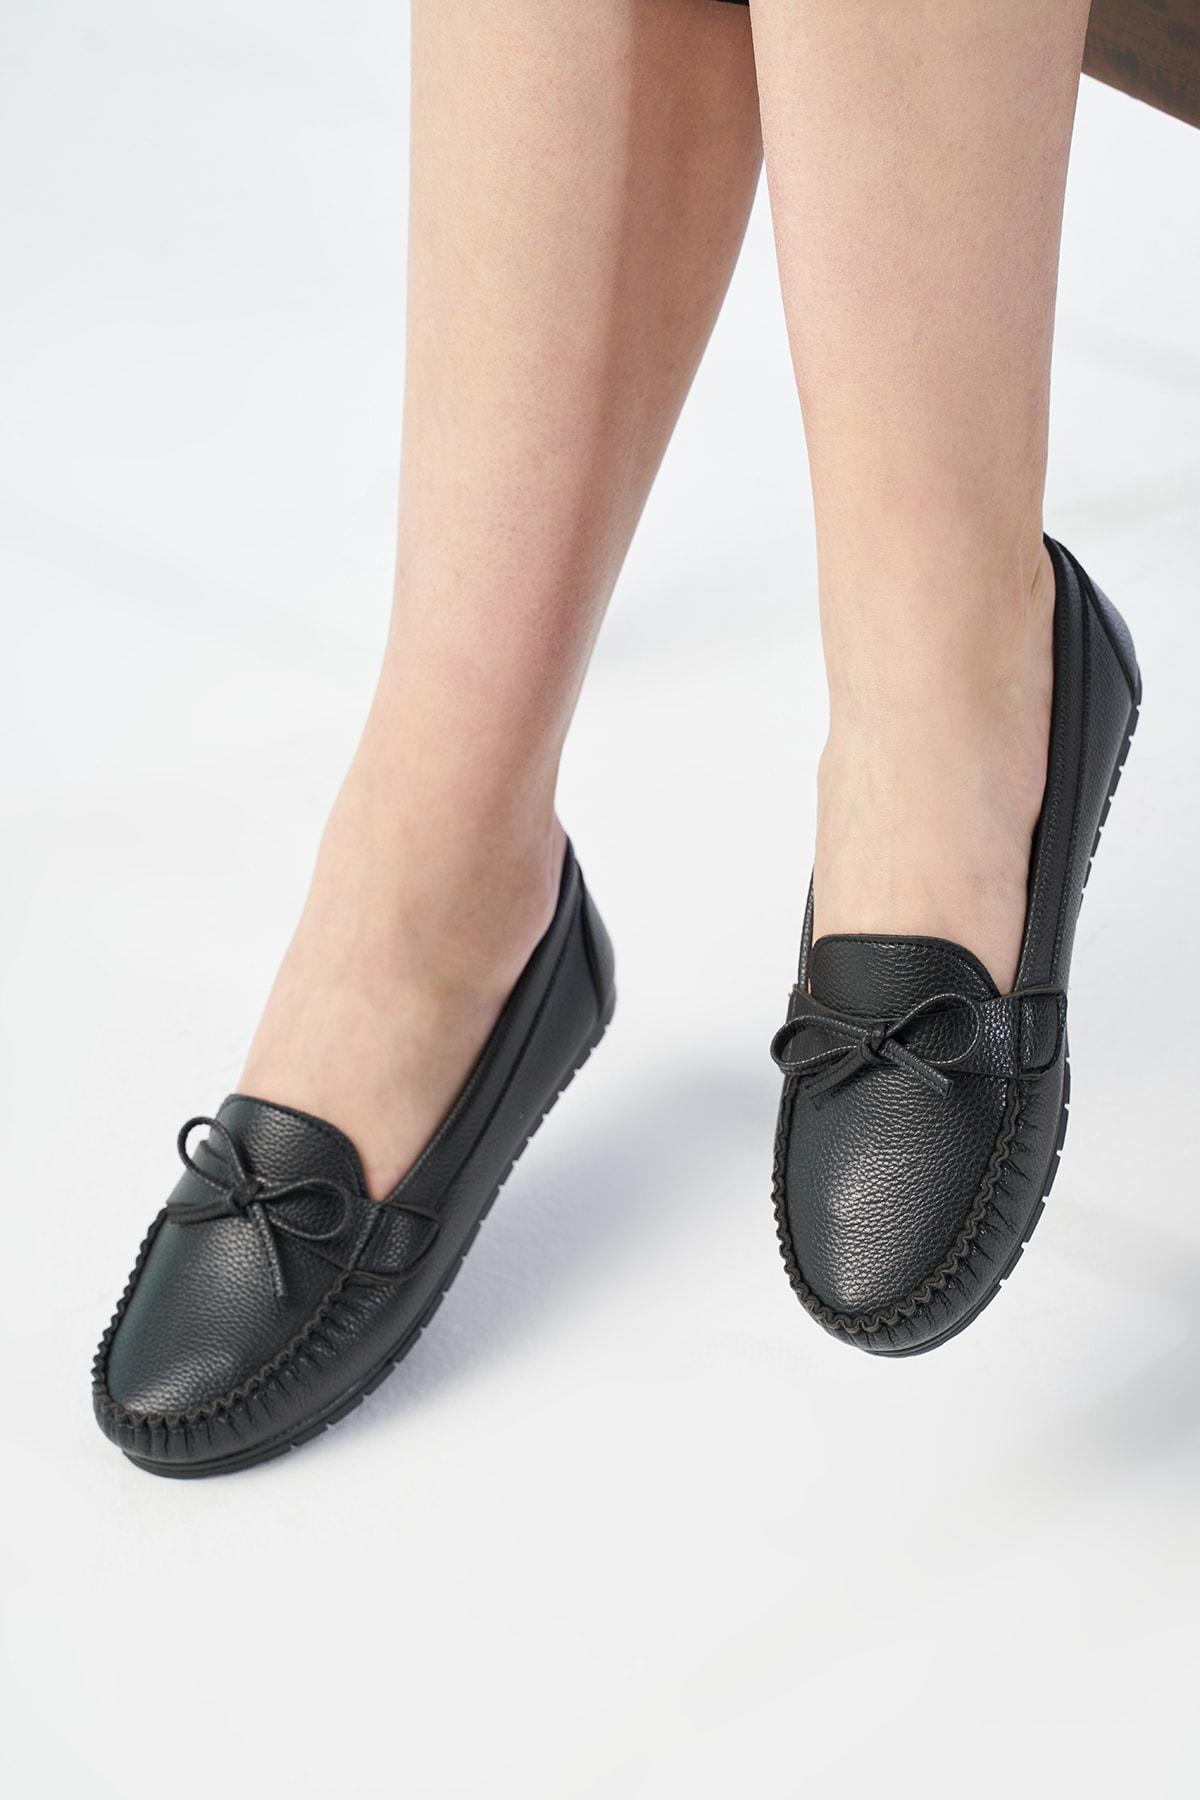 OCT Shoes Siyah Kadın Fiyonk Babet TS1024 1